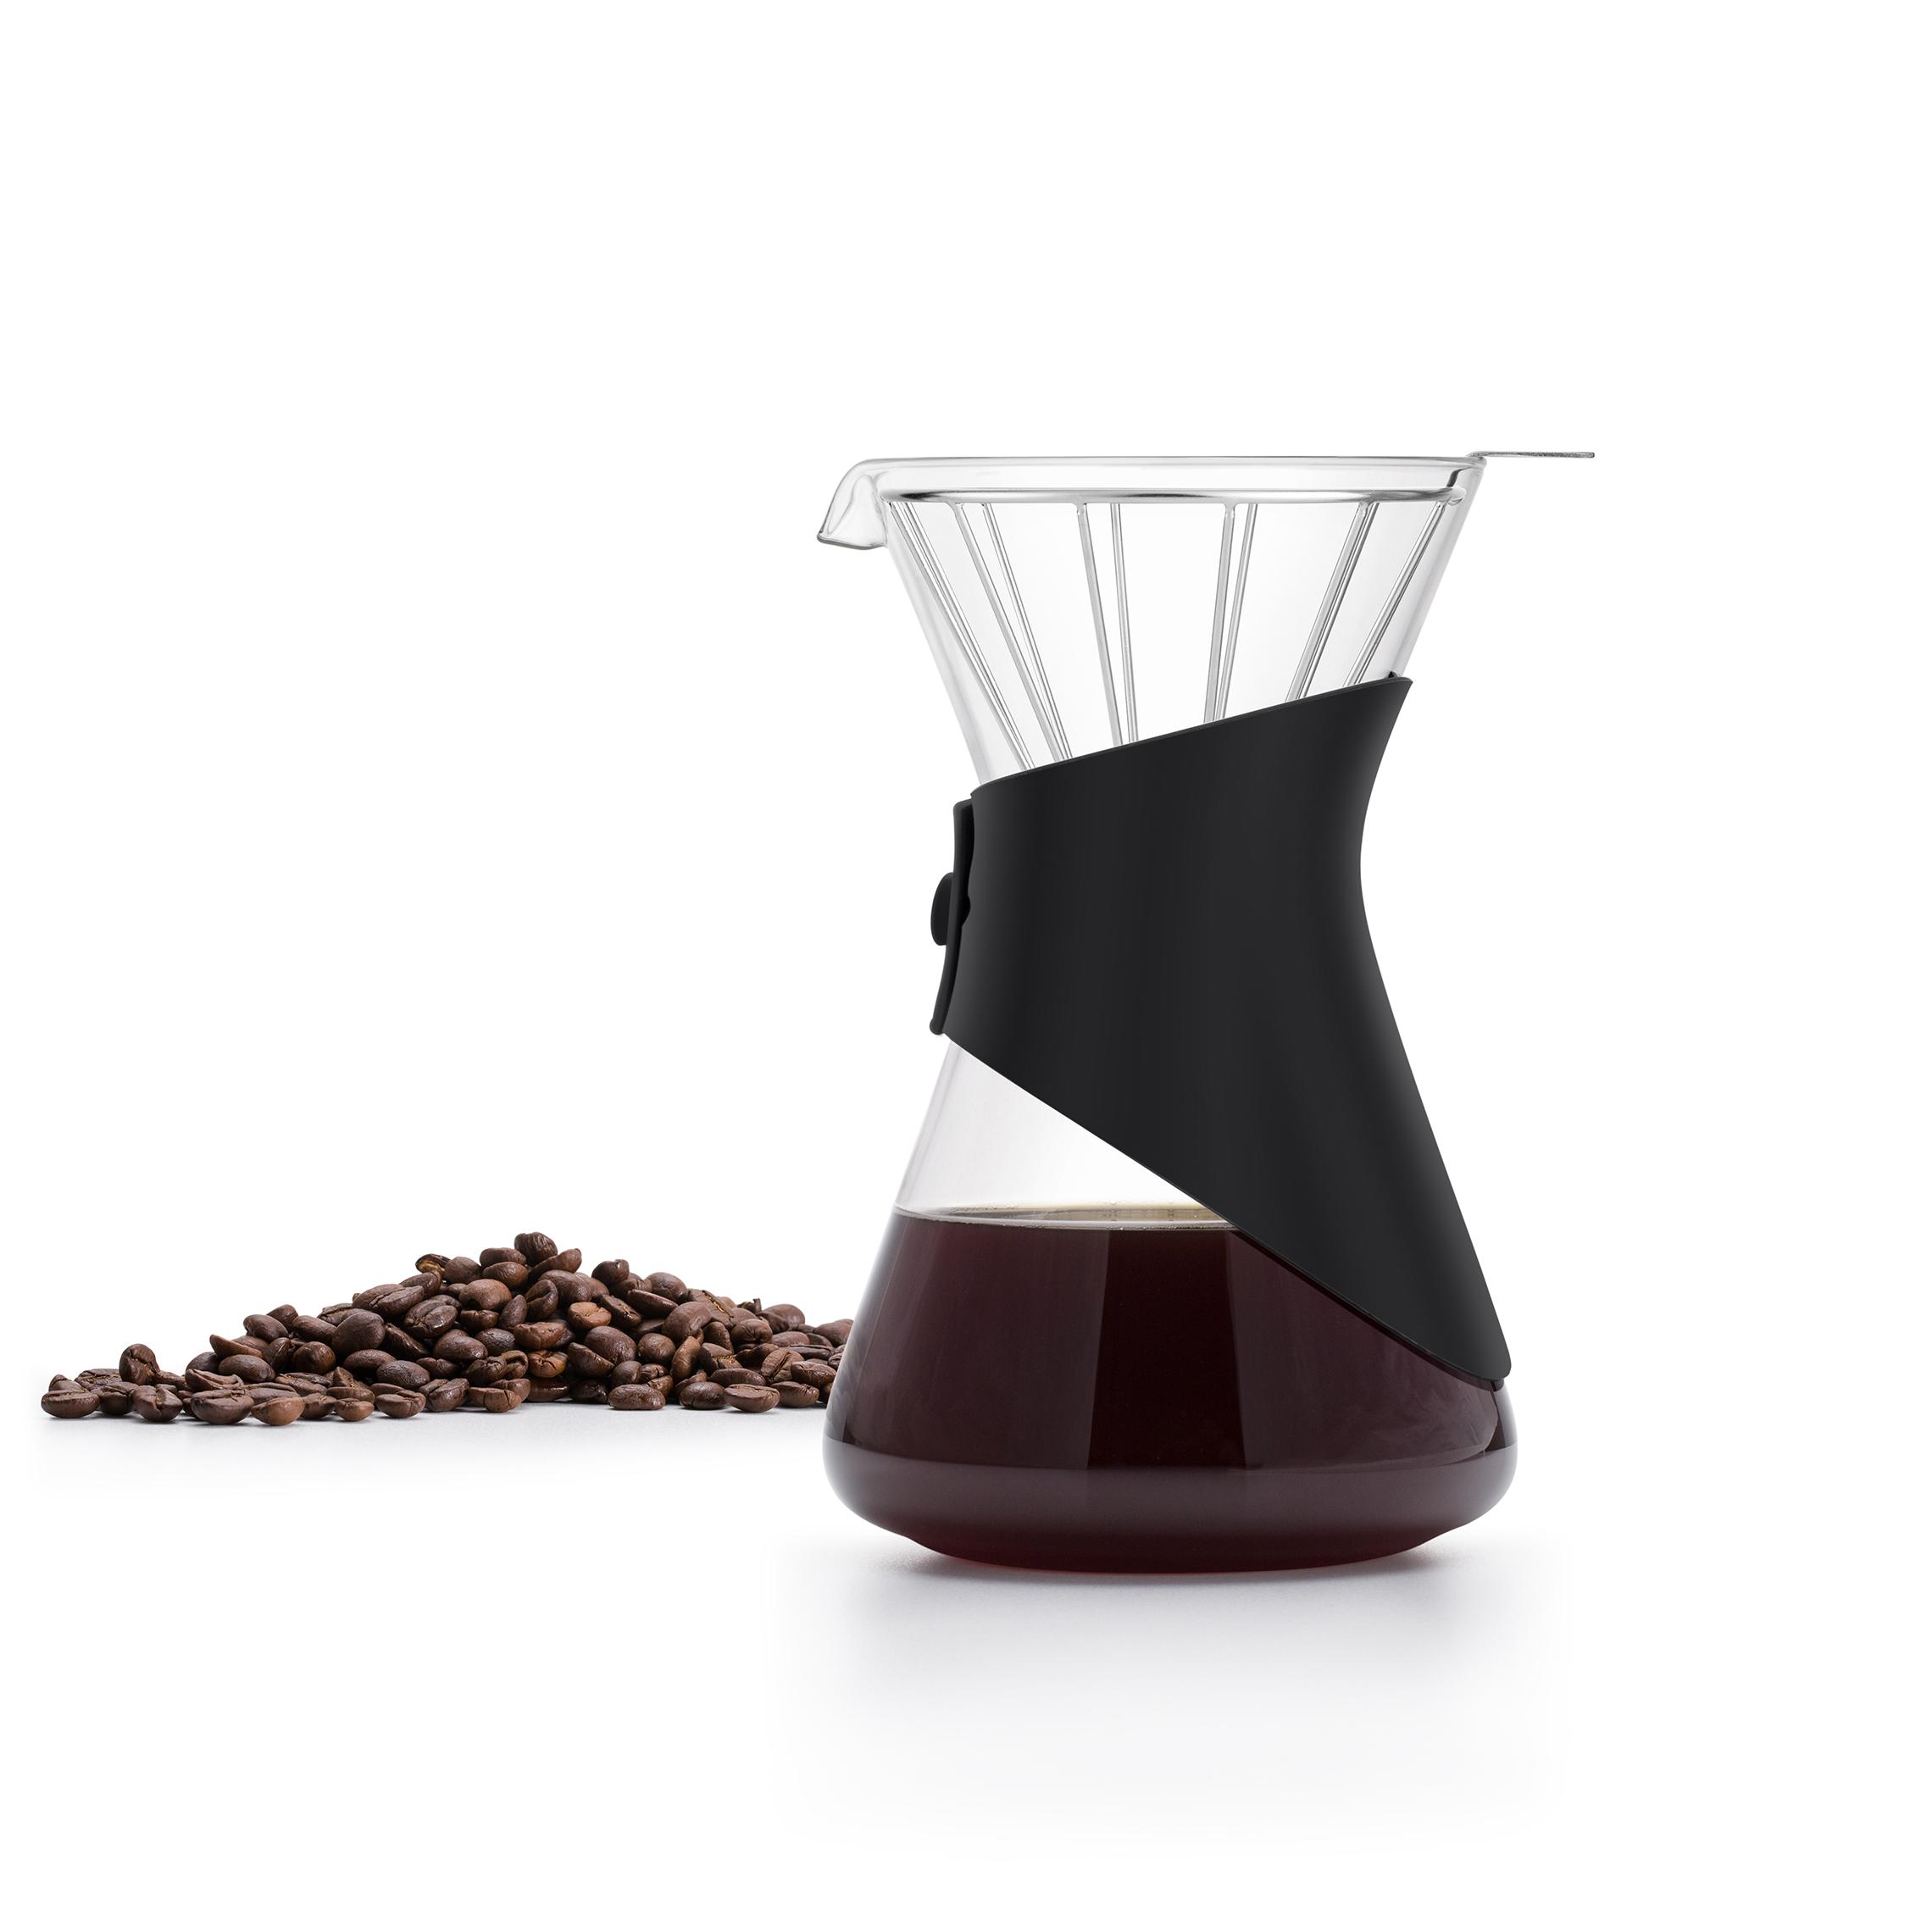 Keeps coffee pure & fresh